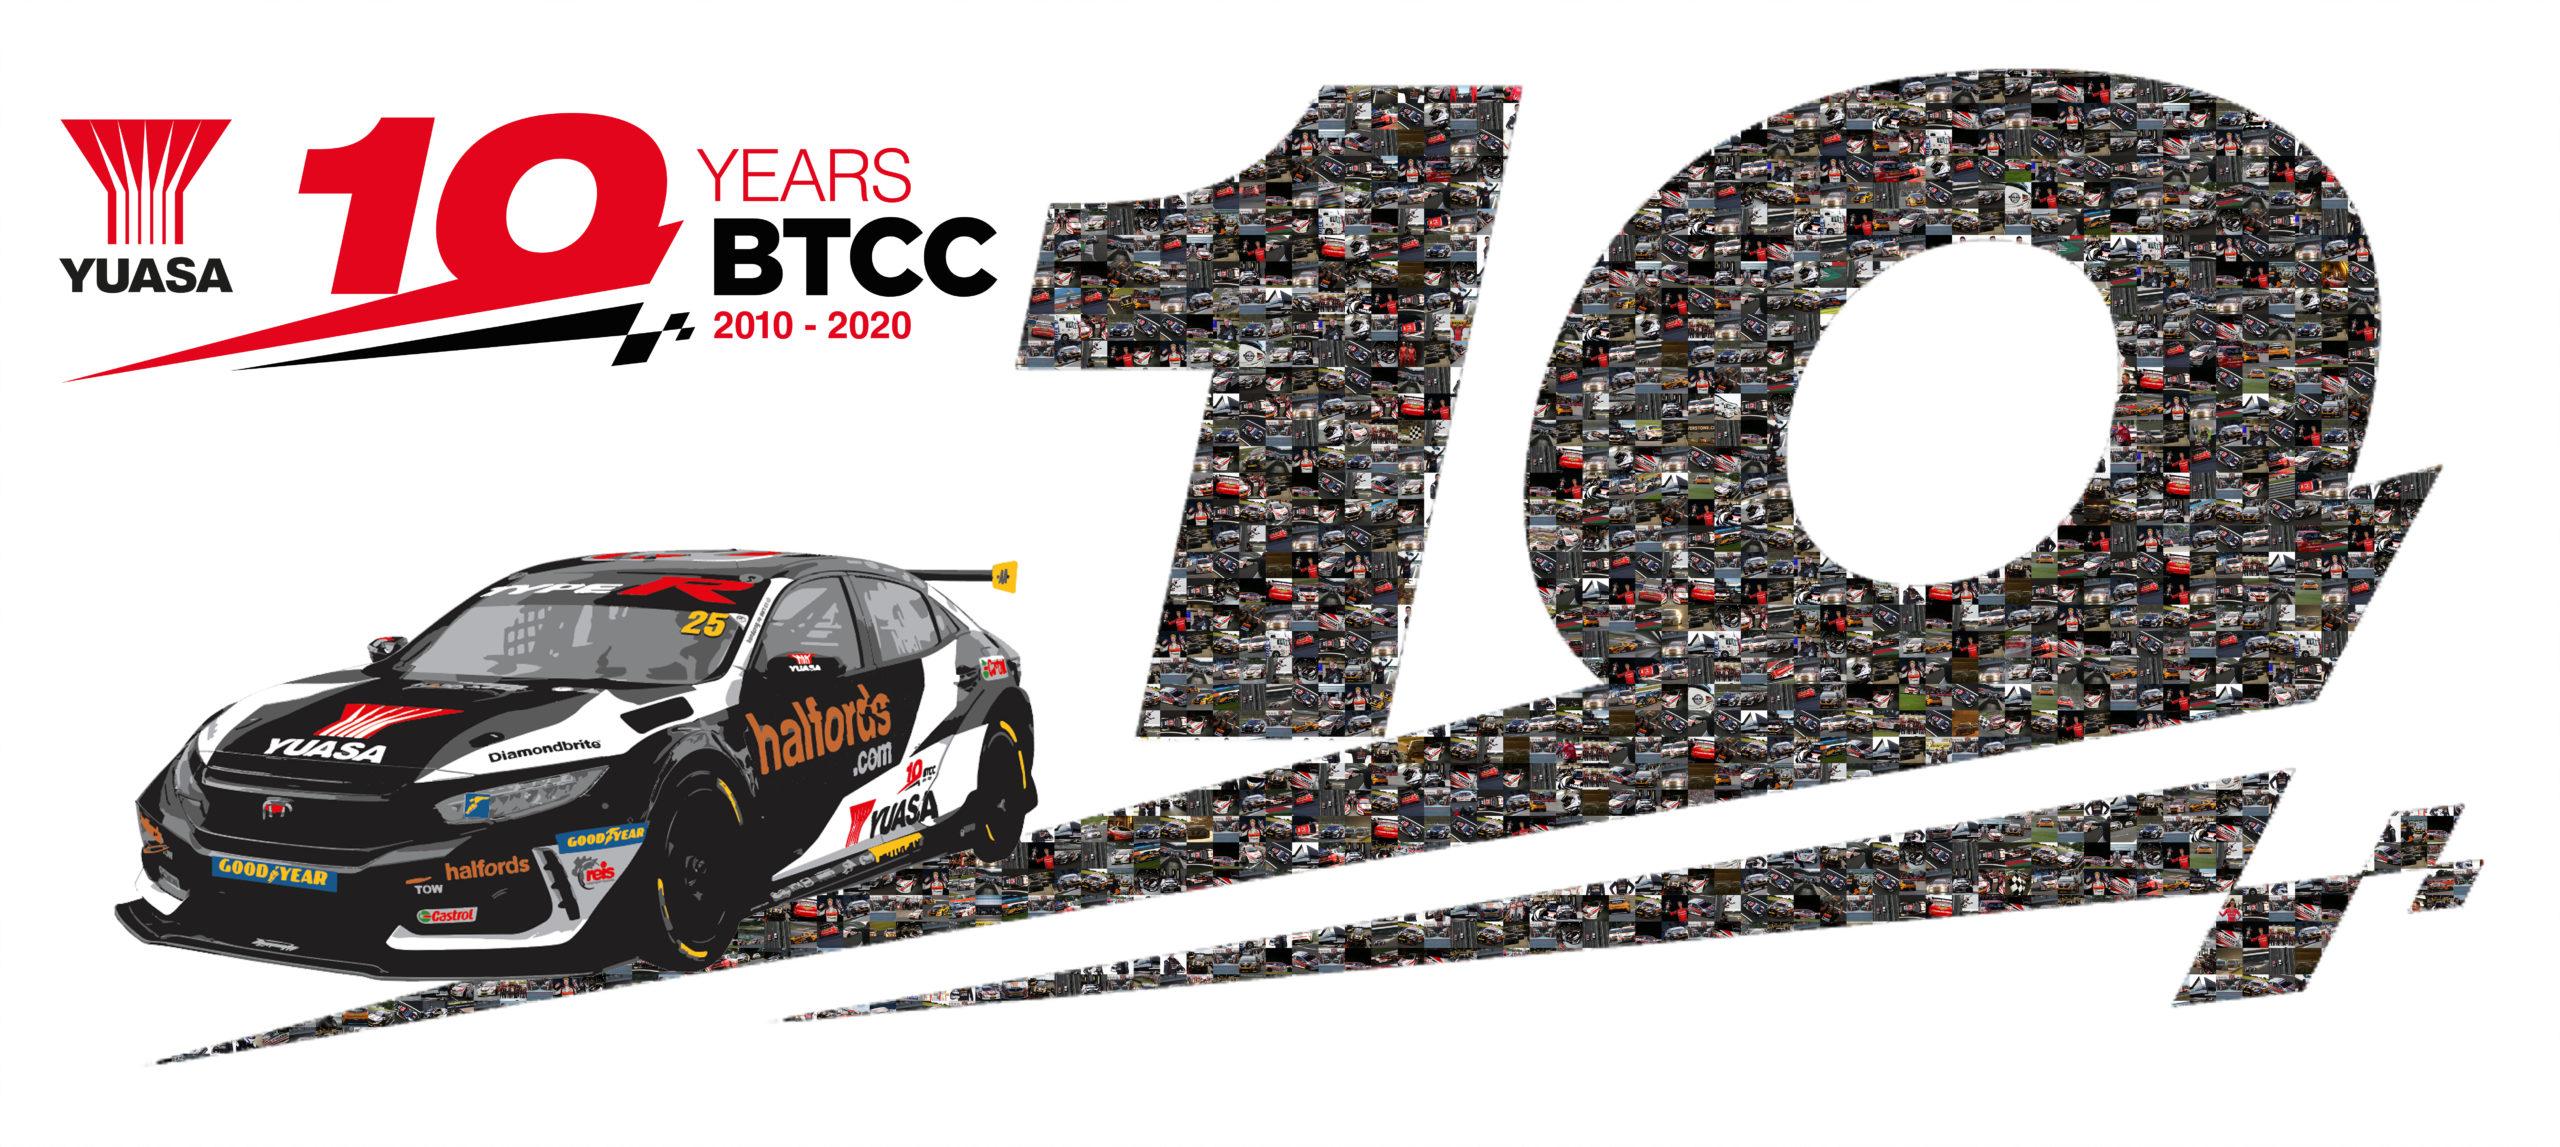 Yuasa - 10 years in BTCC